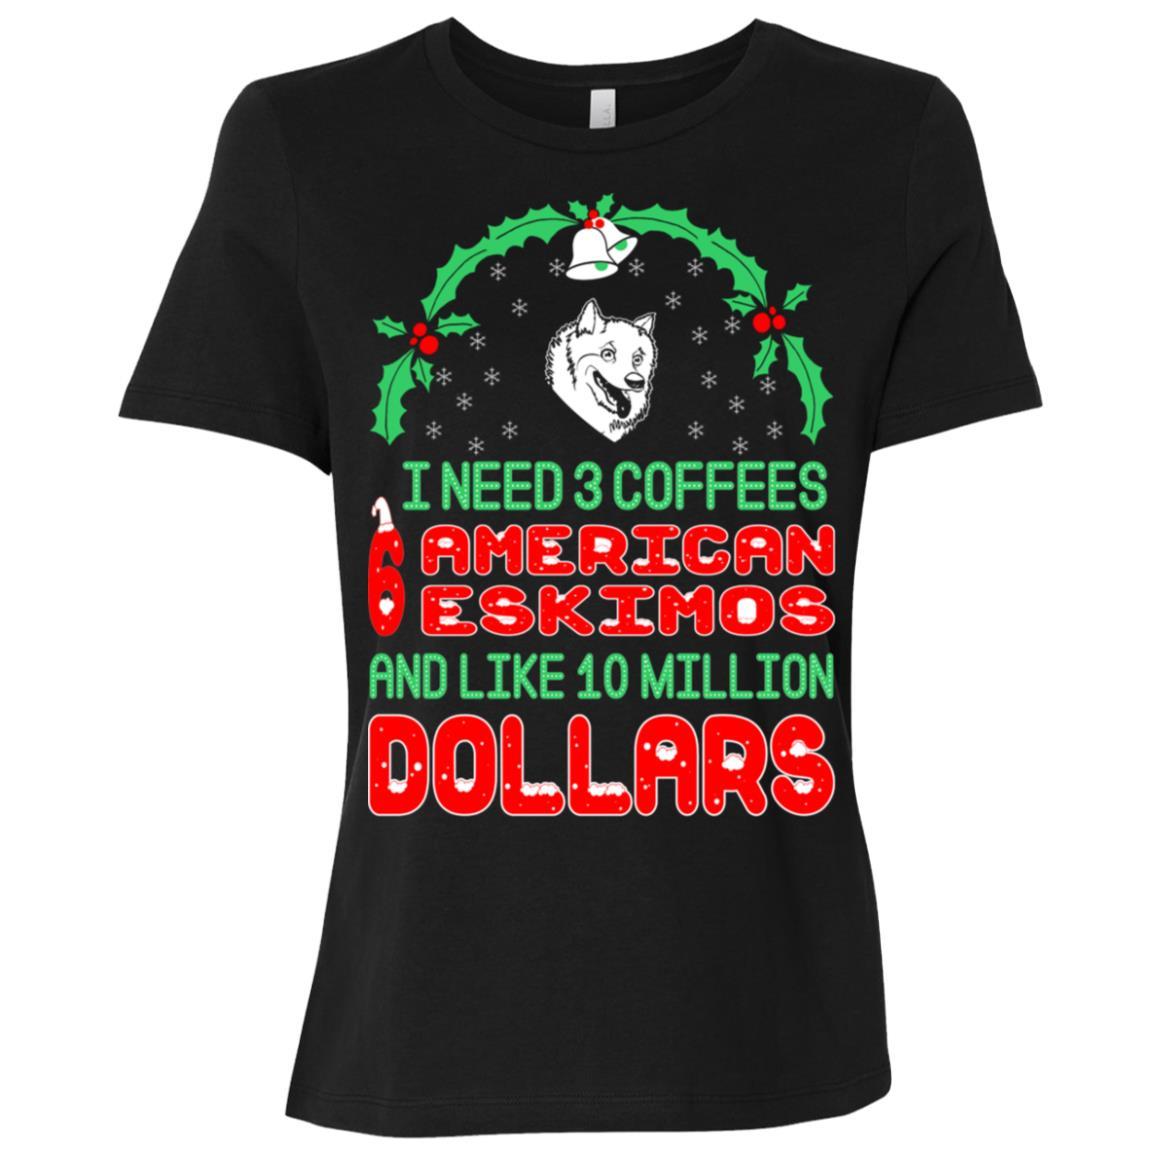 Need 3 Coffees 6 American Eskimos Christmas Ugly Sweater-1 Women Short Sleeve T-Shirt